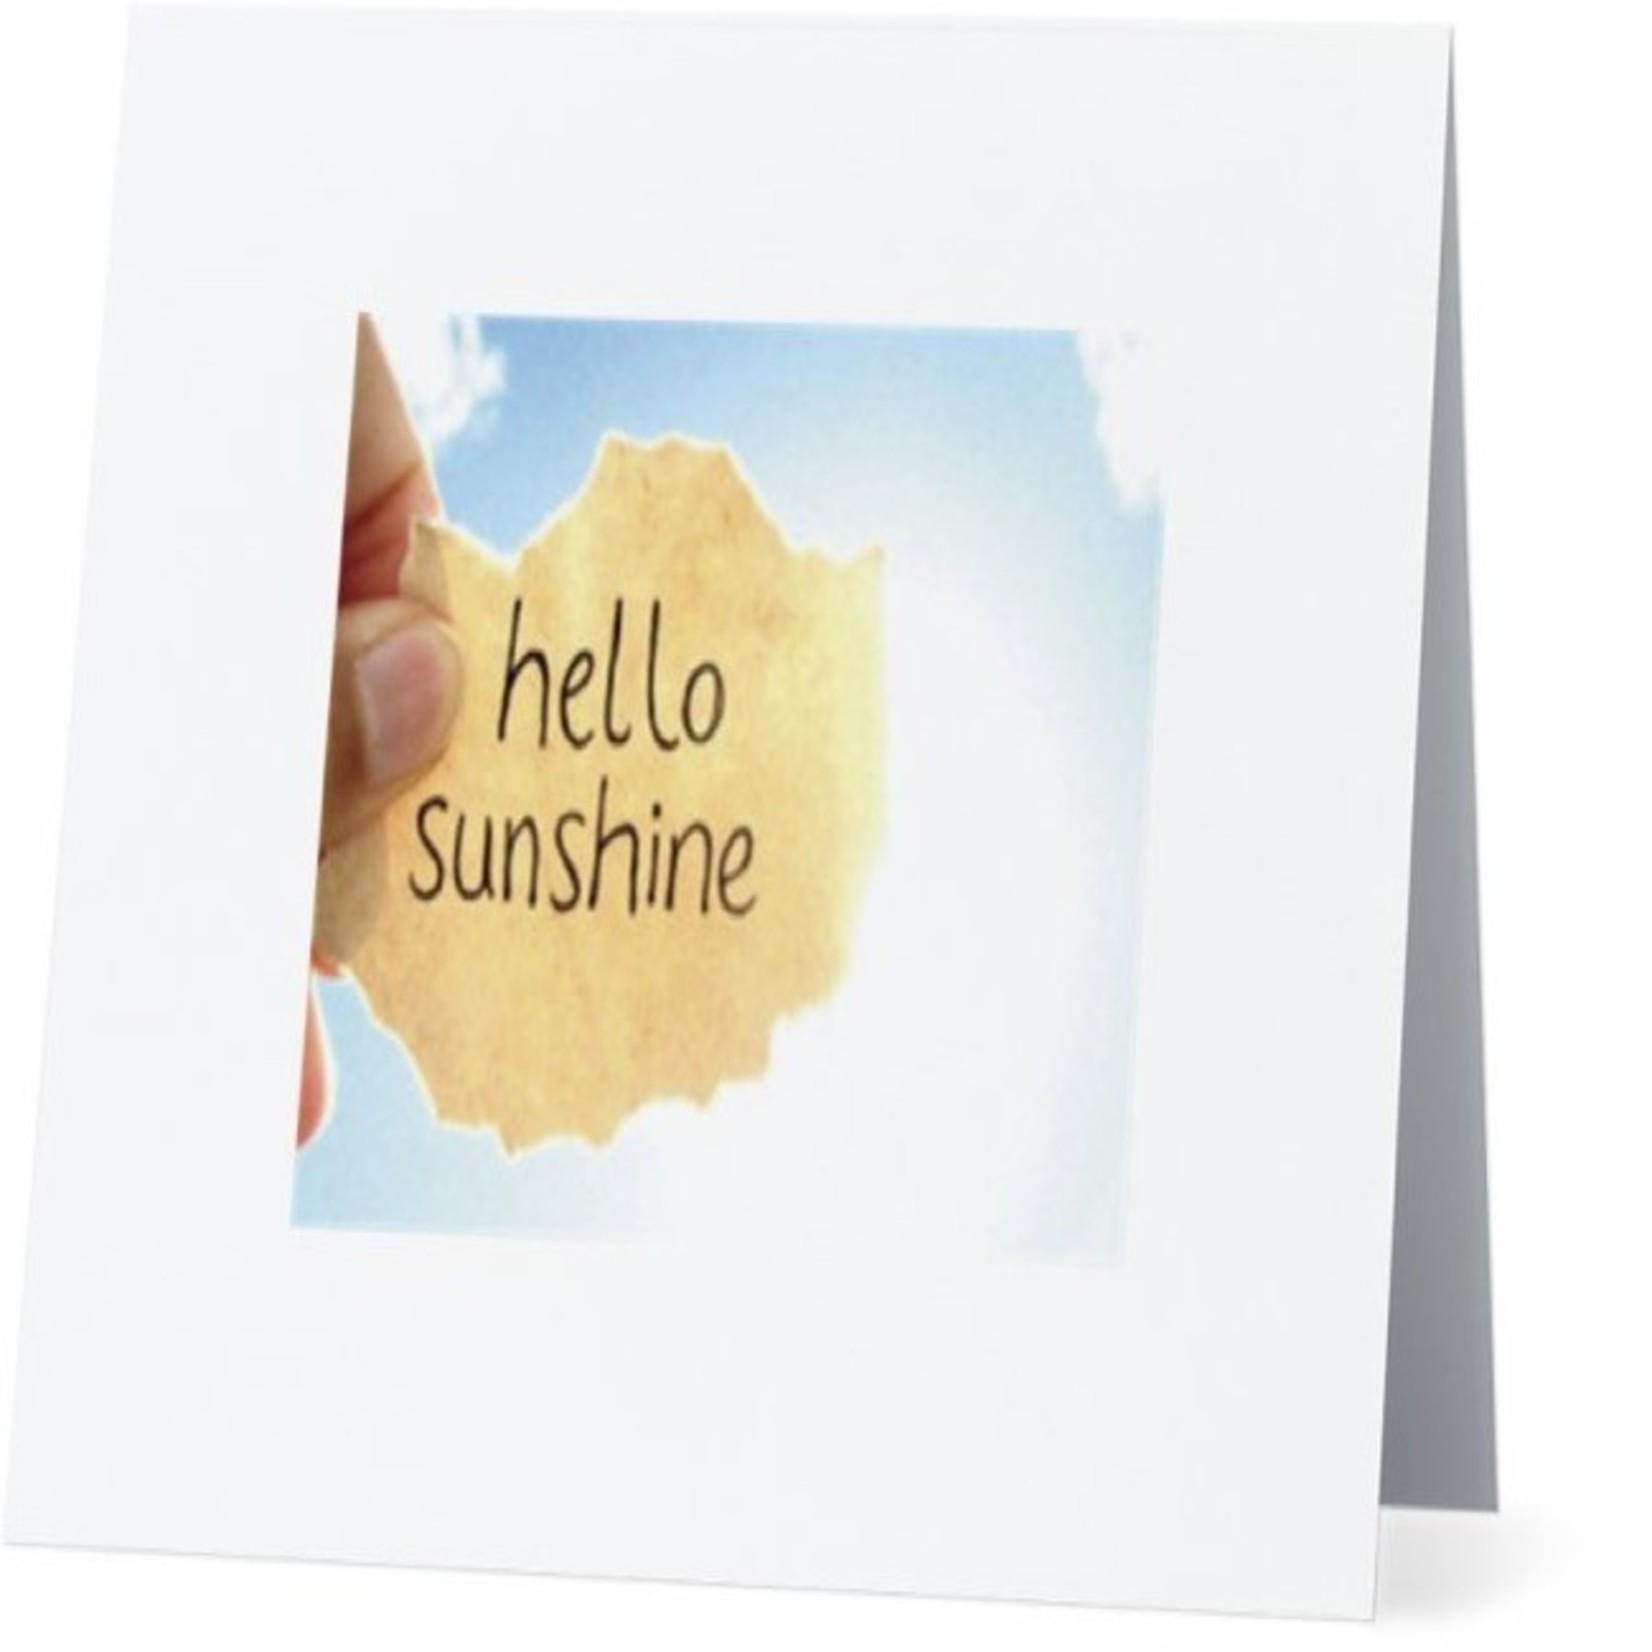 Bad Annie's Card #047 - Hello Sunshine